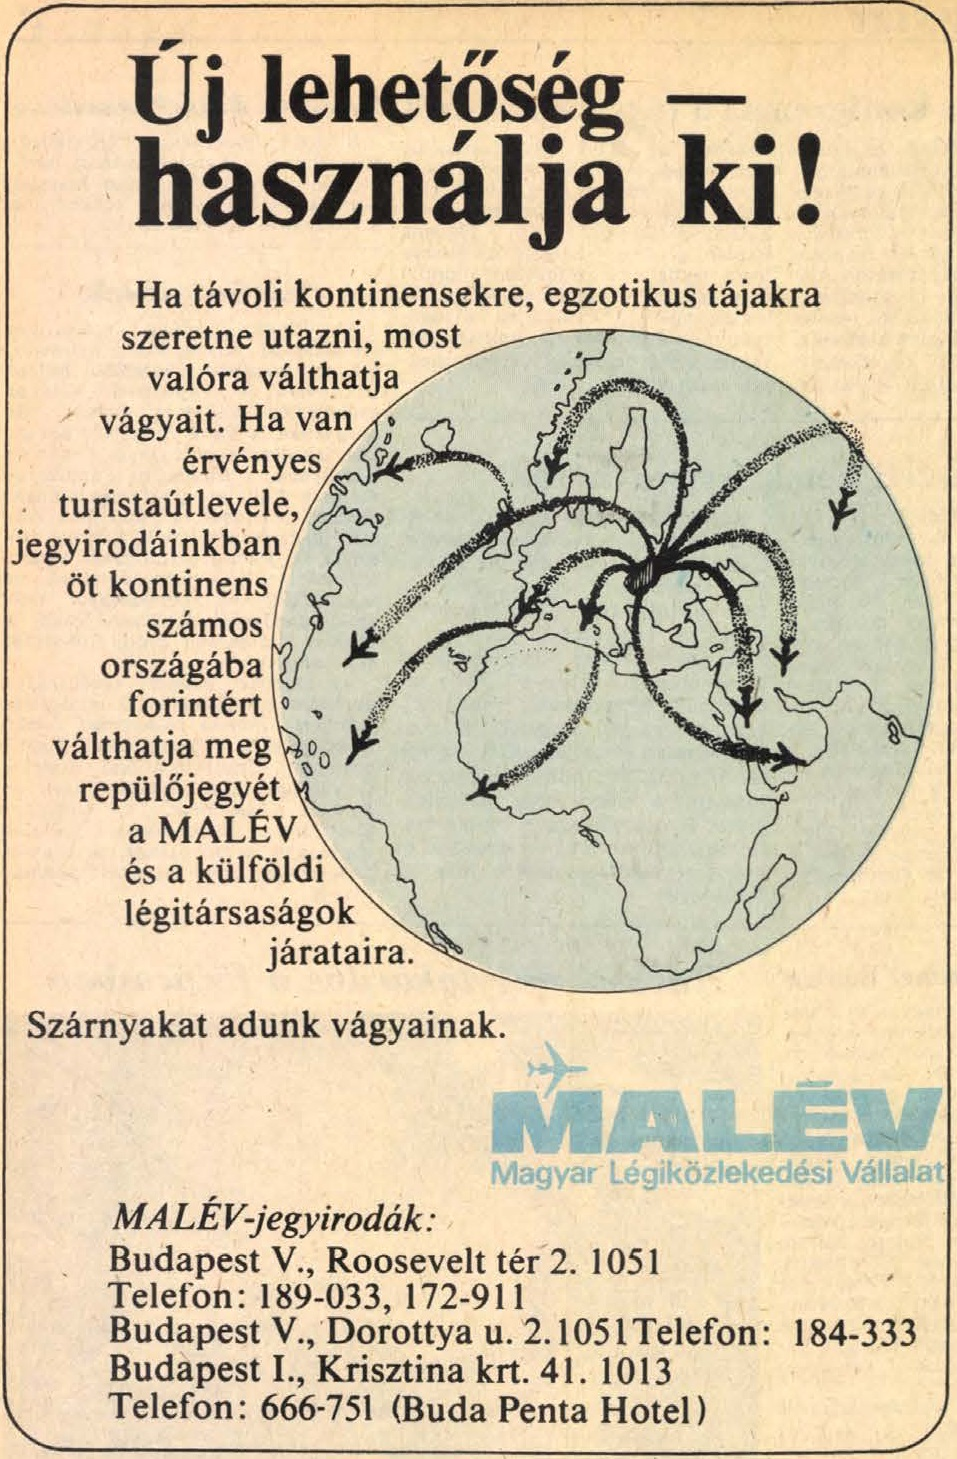 idokapszula_nb_i_1983_84_klubcsapataink_nemzetkozi_kupaszereplese_3_fordulo_1_kor_reklam_1.jpg